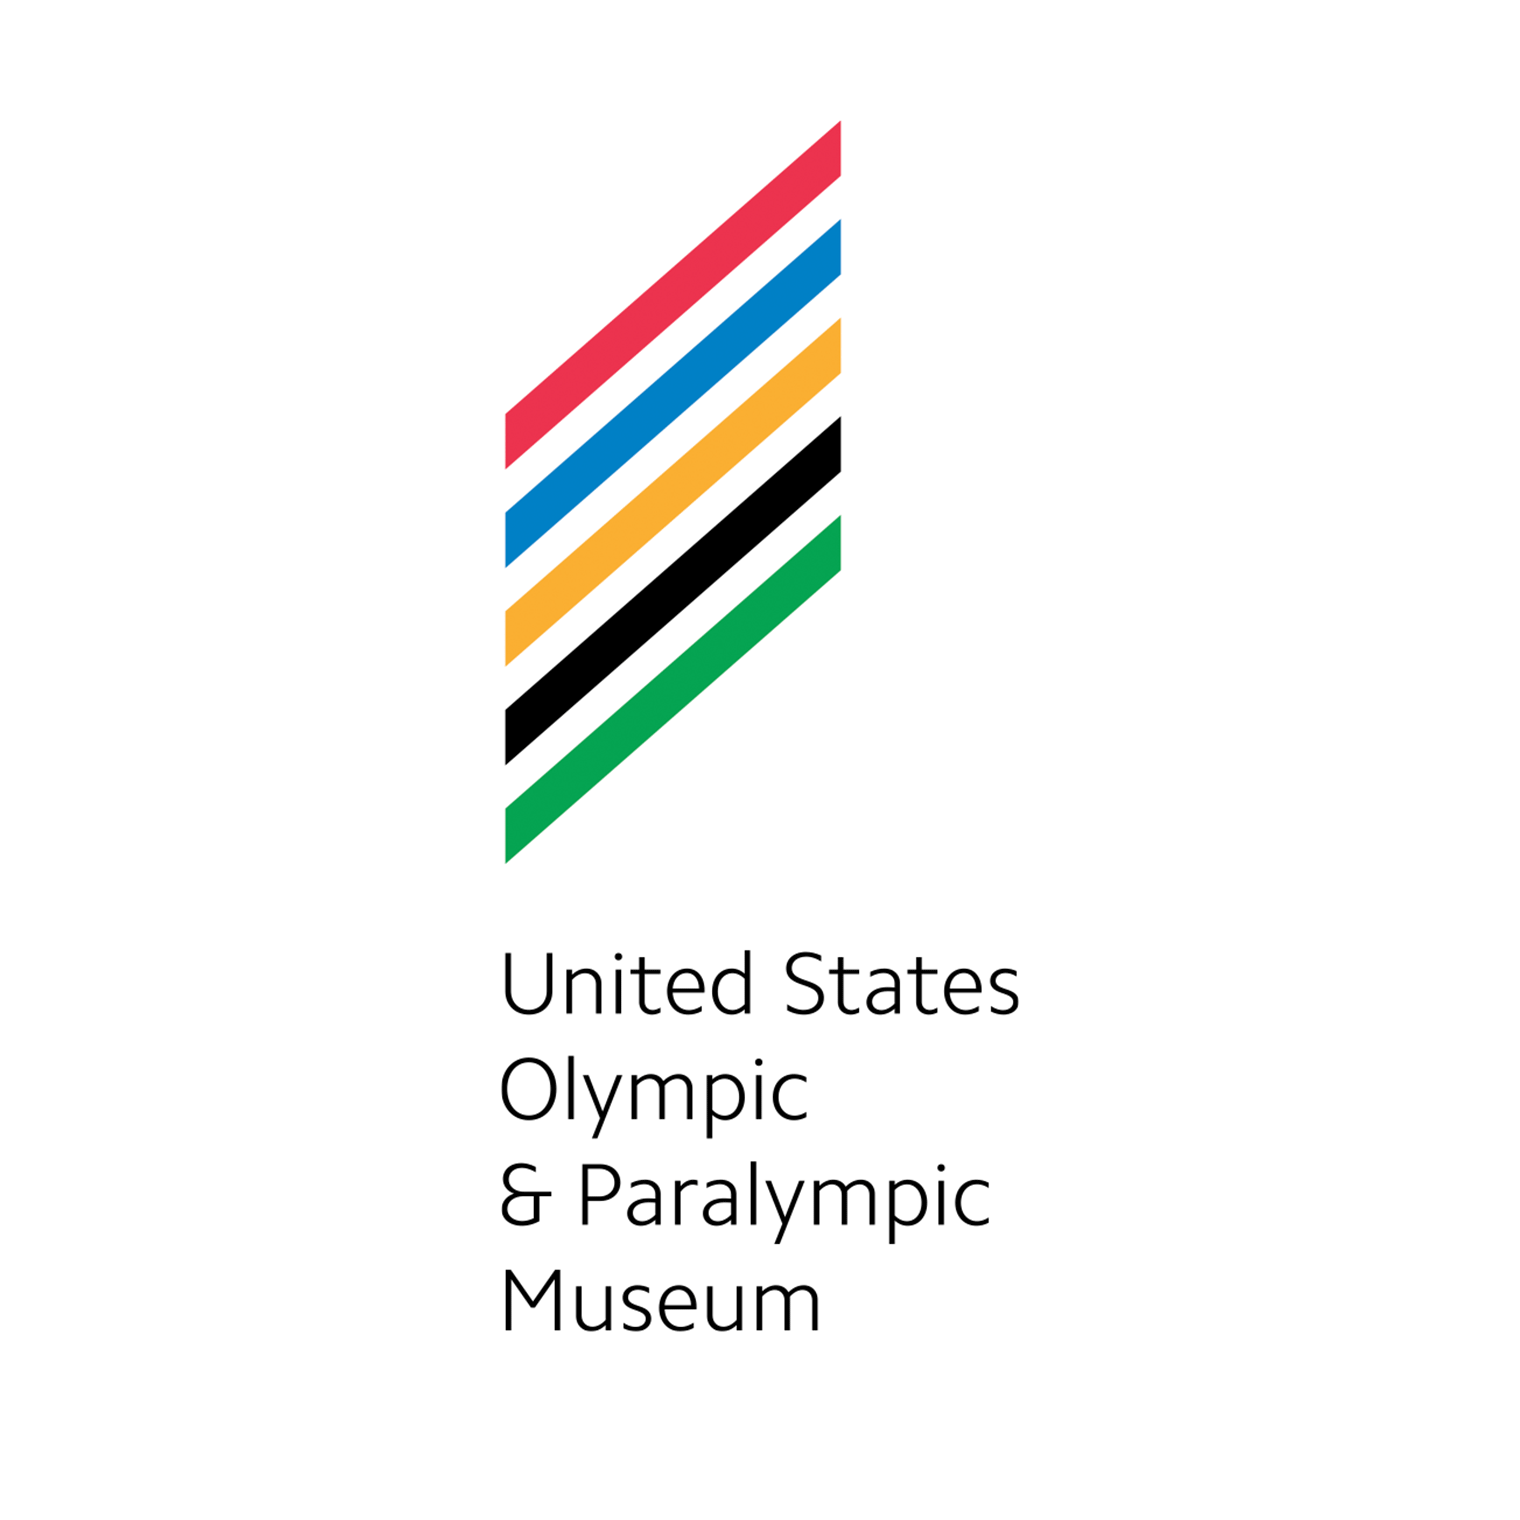 New Logo and Identity for USOPM by Chermayeff & Geismar & Haviv